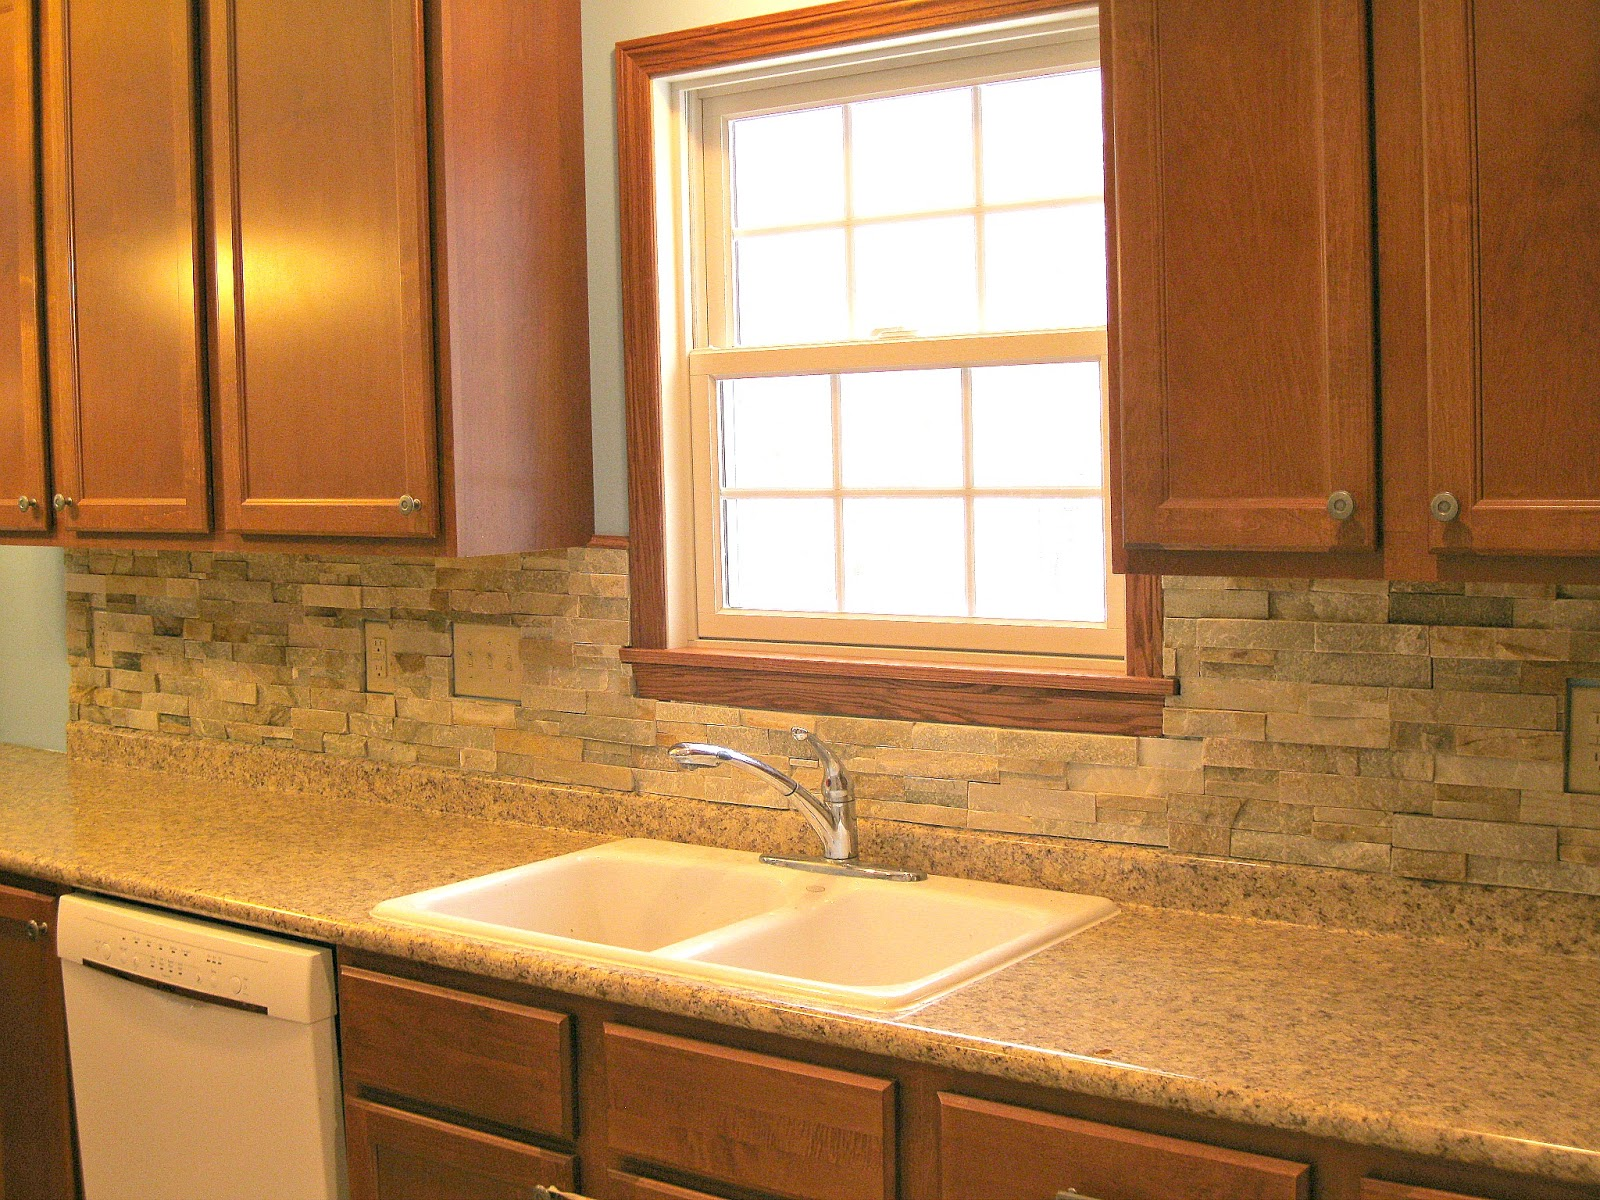 Kitchen Tile Backsplash Design Ideas - 2018 Kitchen Design ...